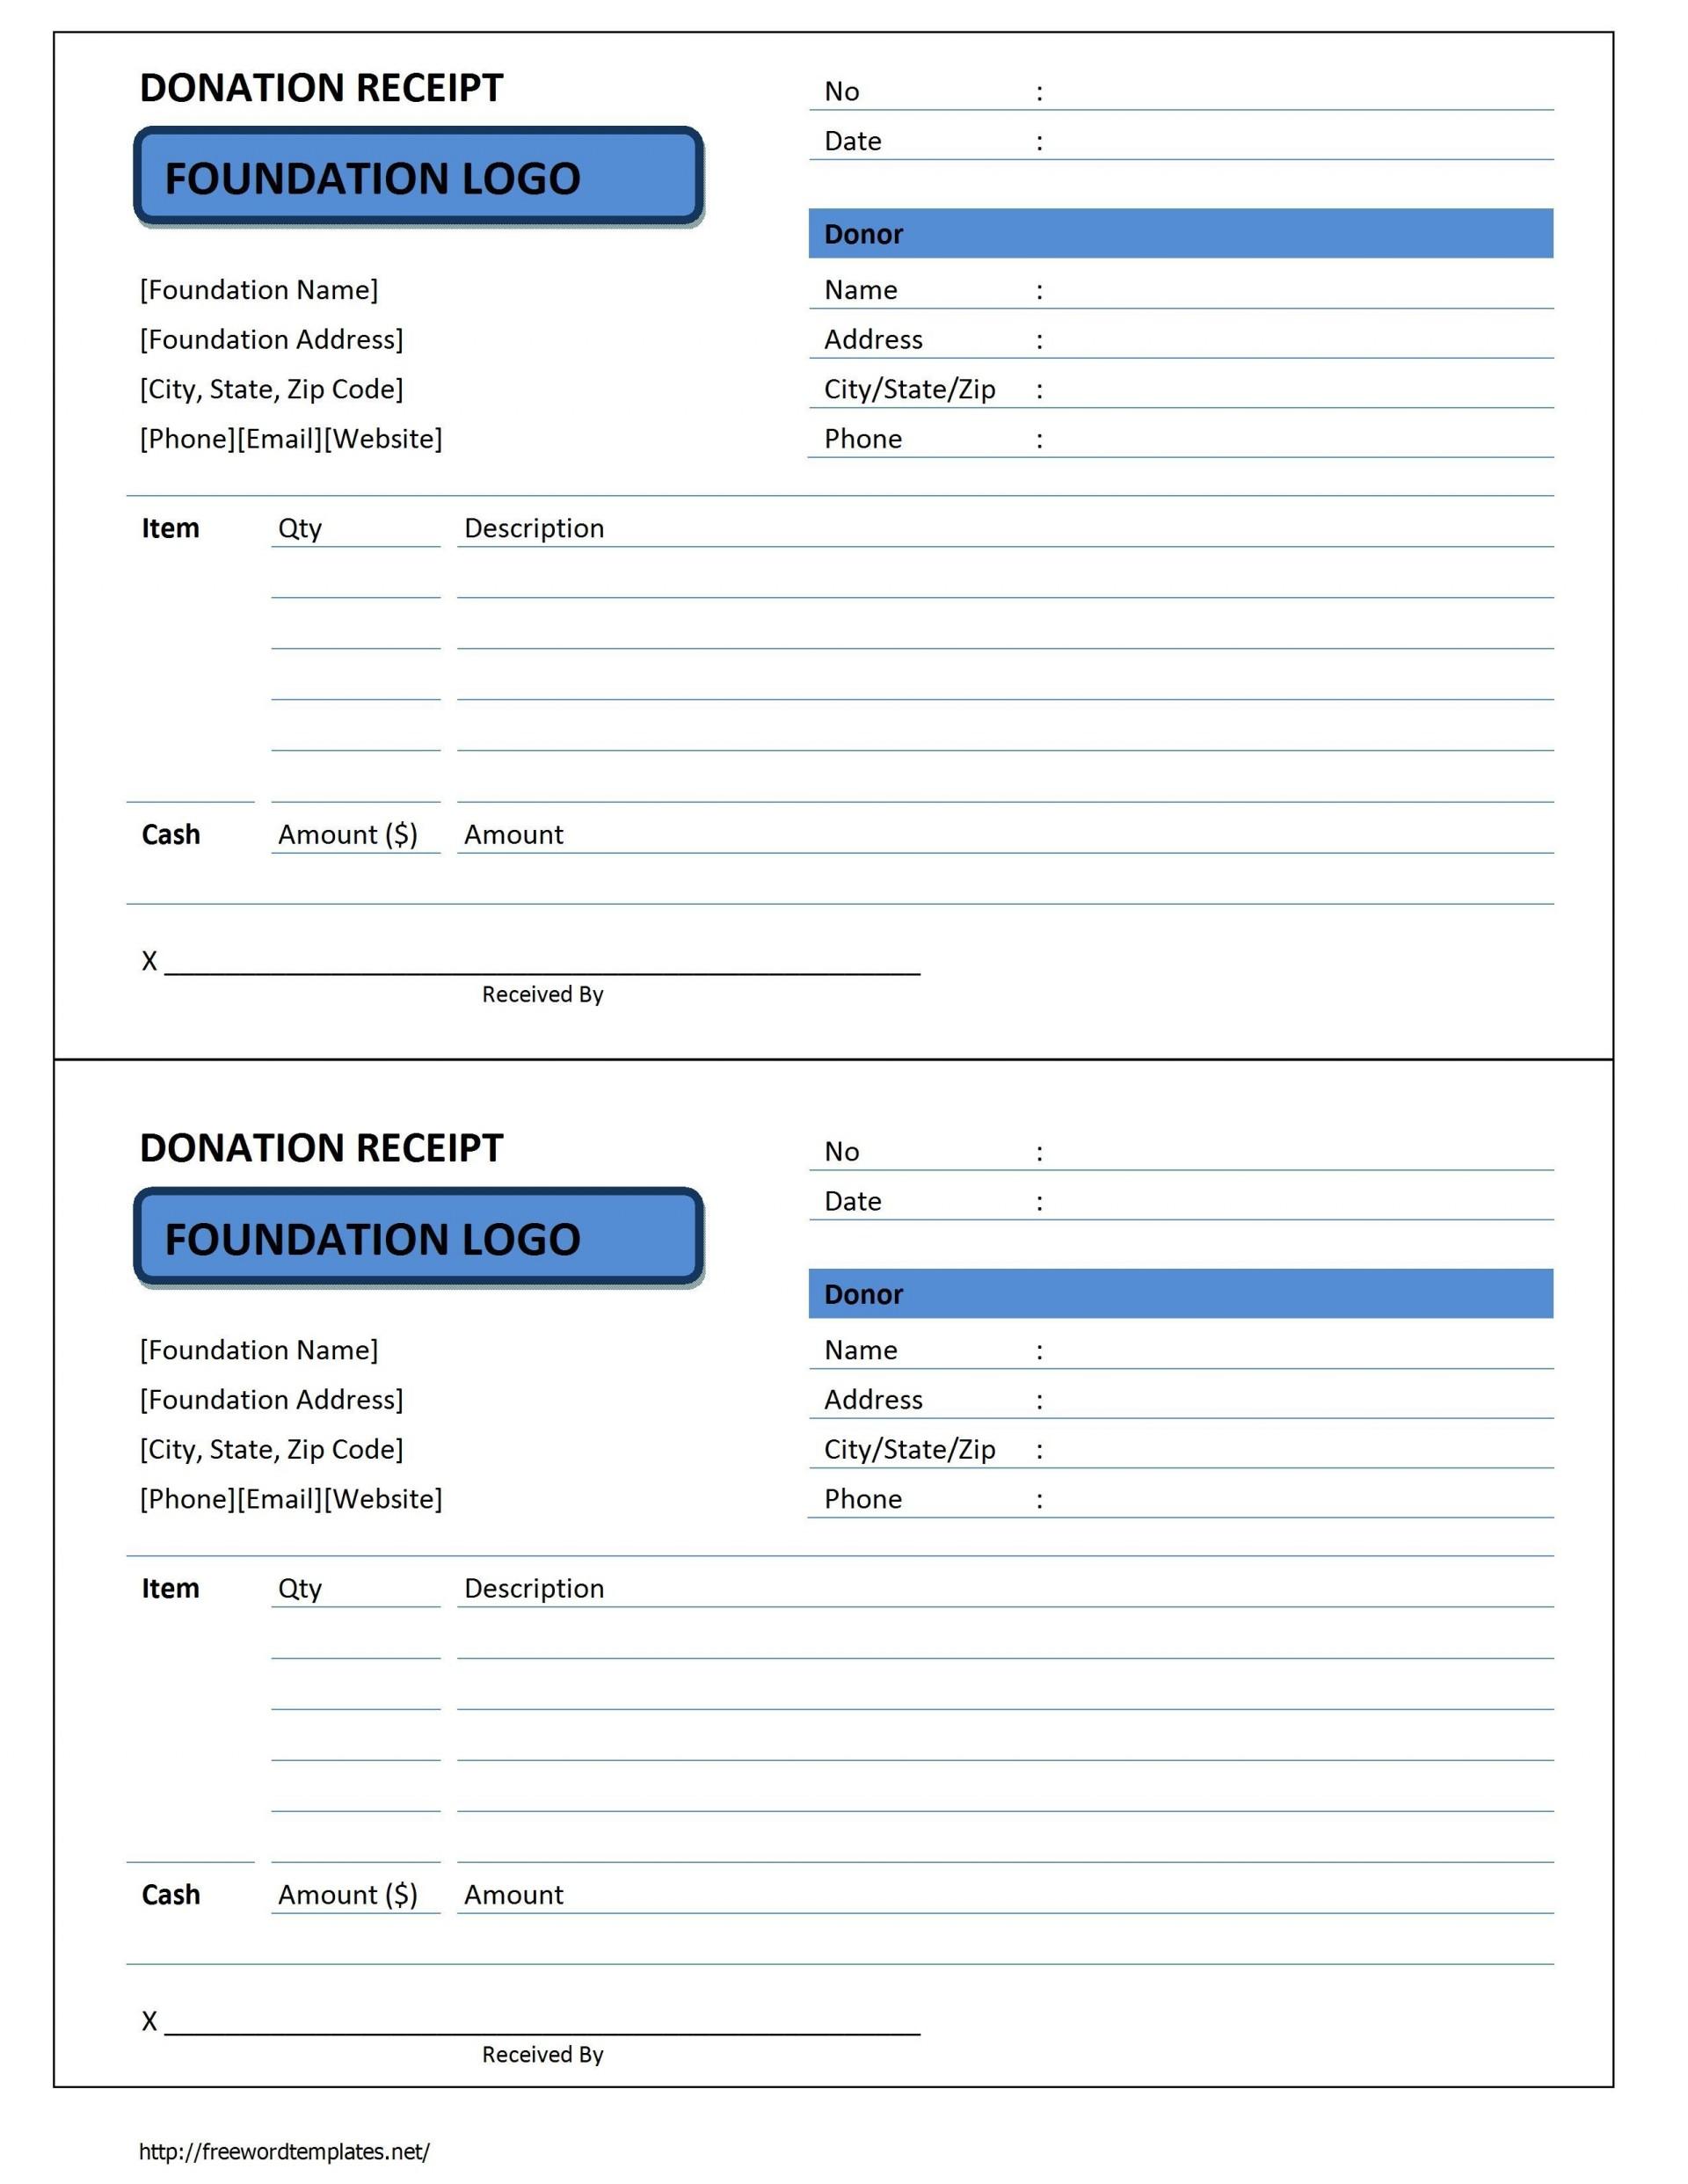 006 Exceptional Charitable Tax Receipt Template Idea  Donation1920